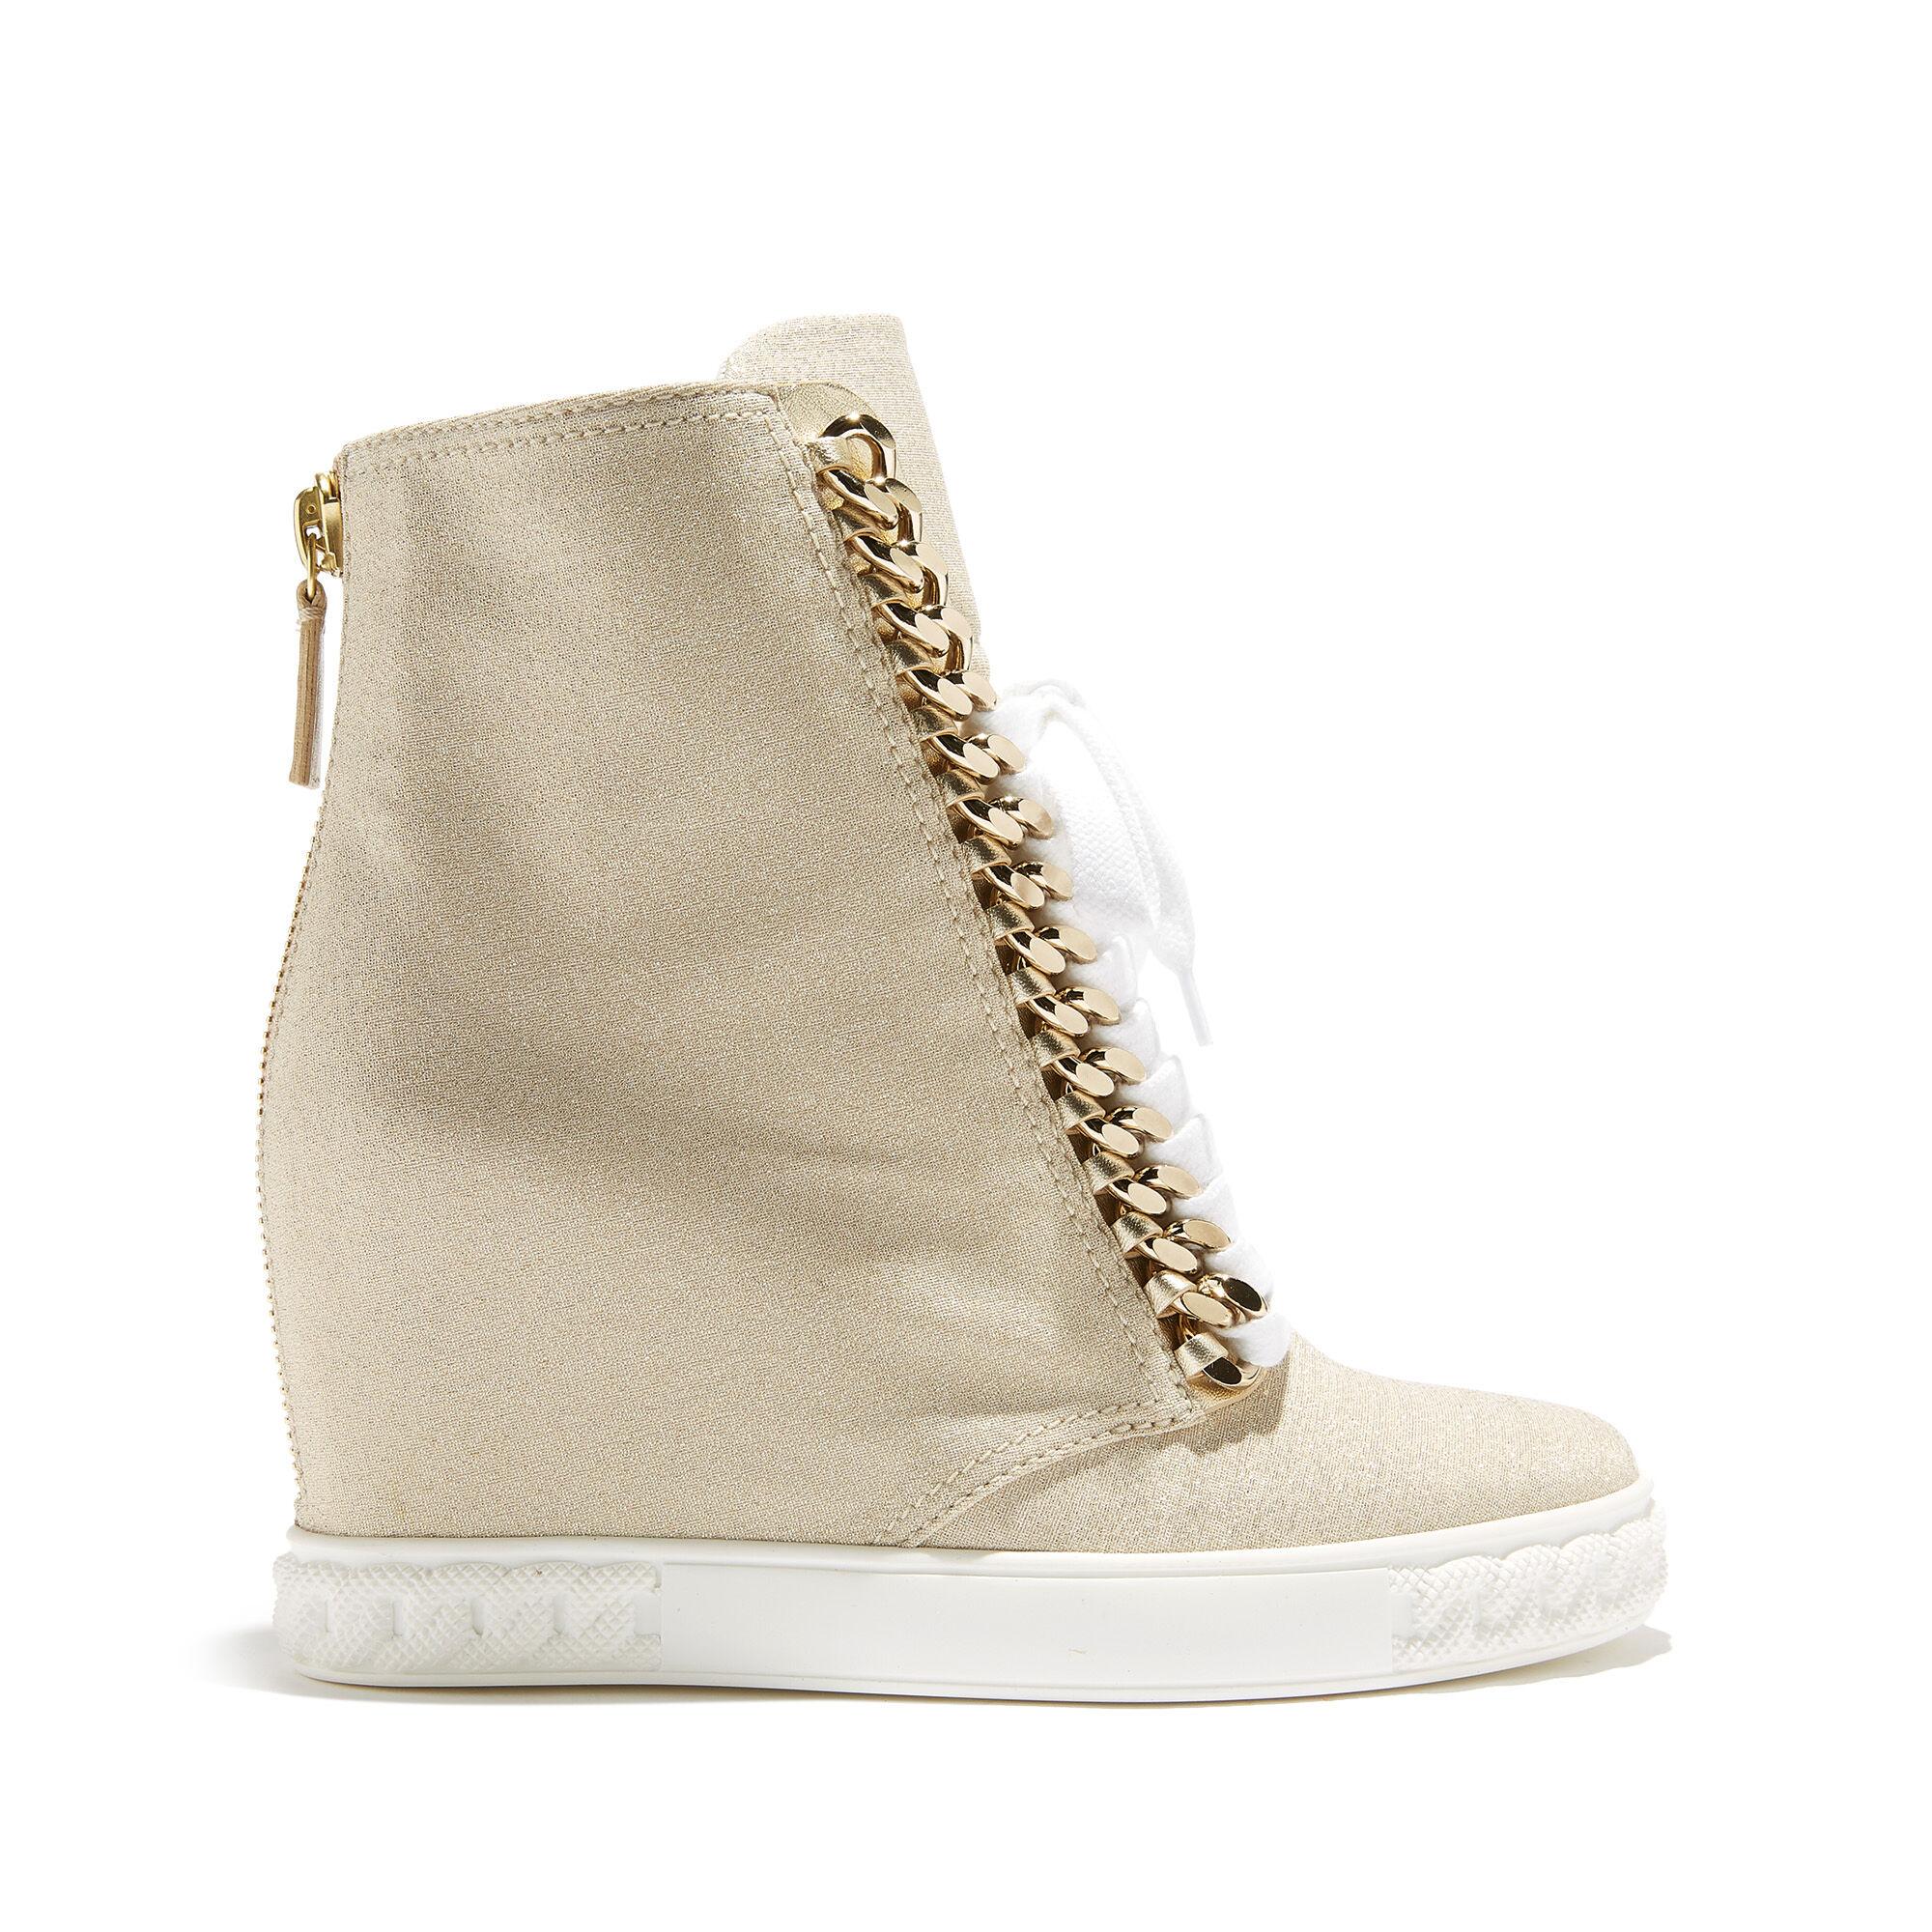 Da Di Di Lusso Sneakers DonnaCasadei Sneakers OPiXTuZk